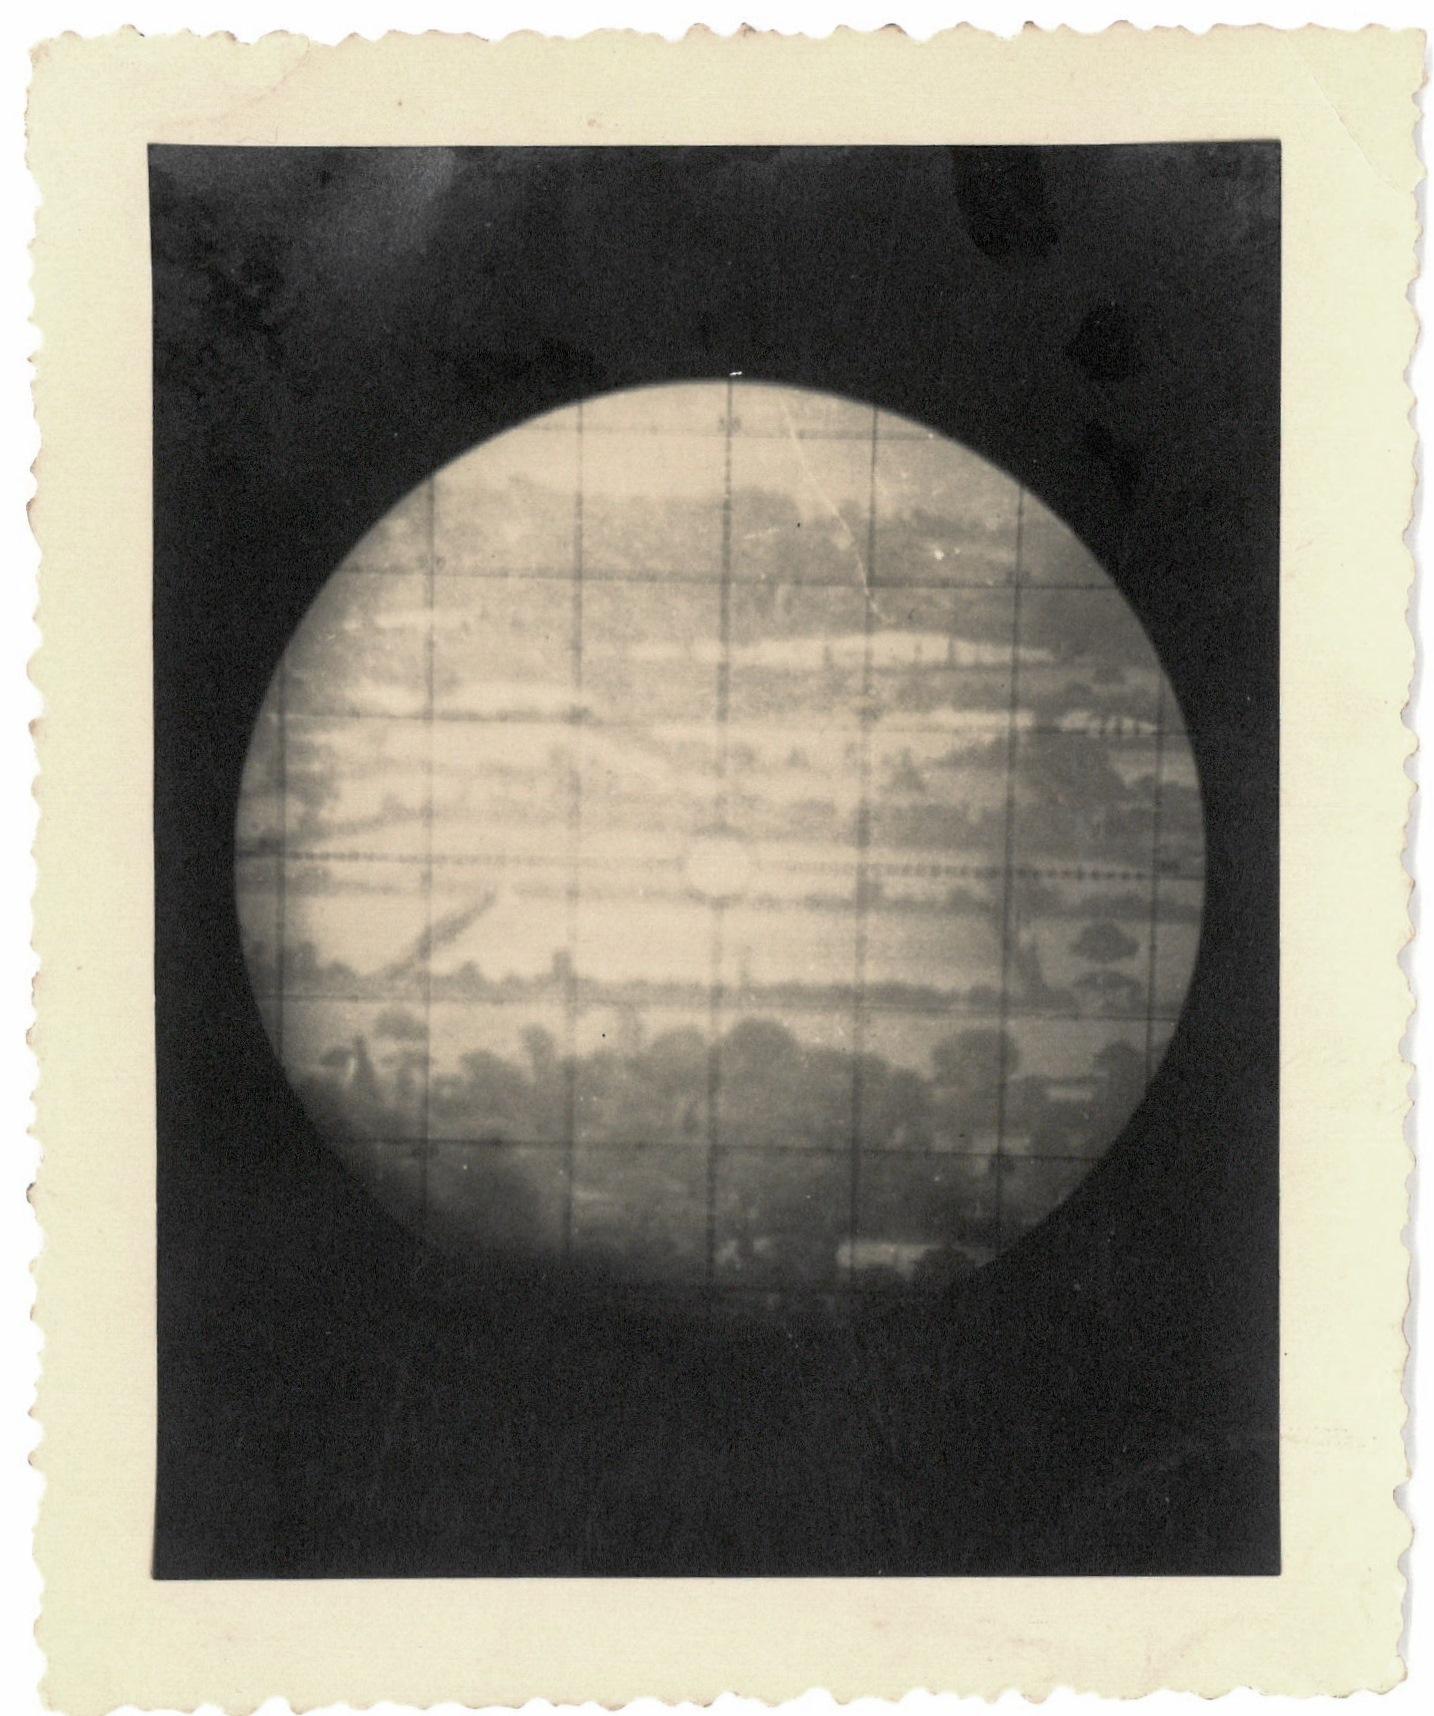 ''Shot through az. instrument on flash O.P. near St Lo' 1944